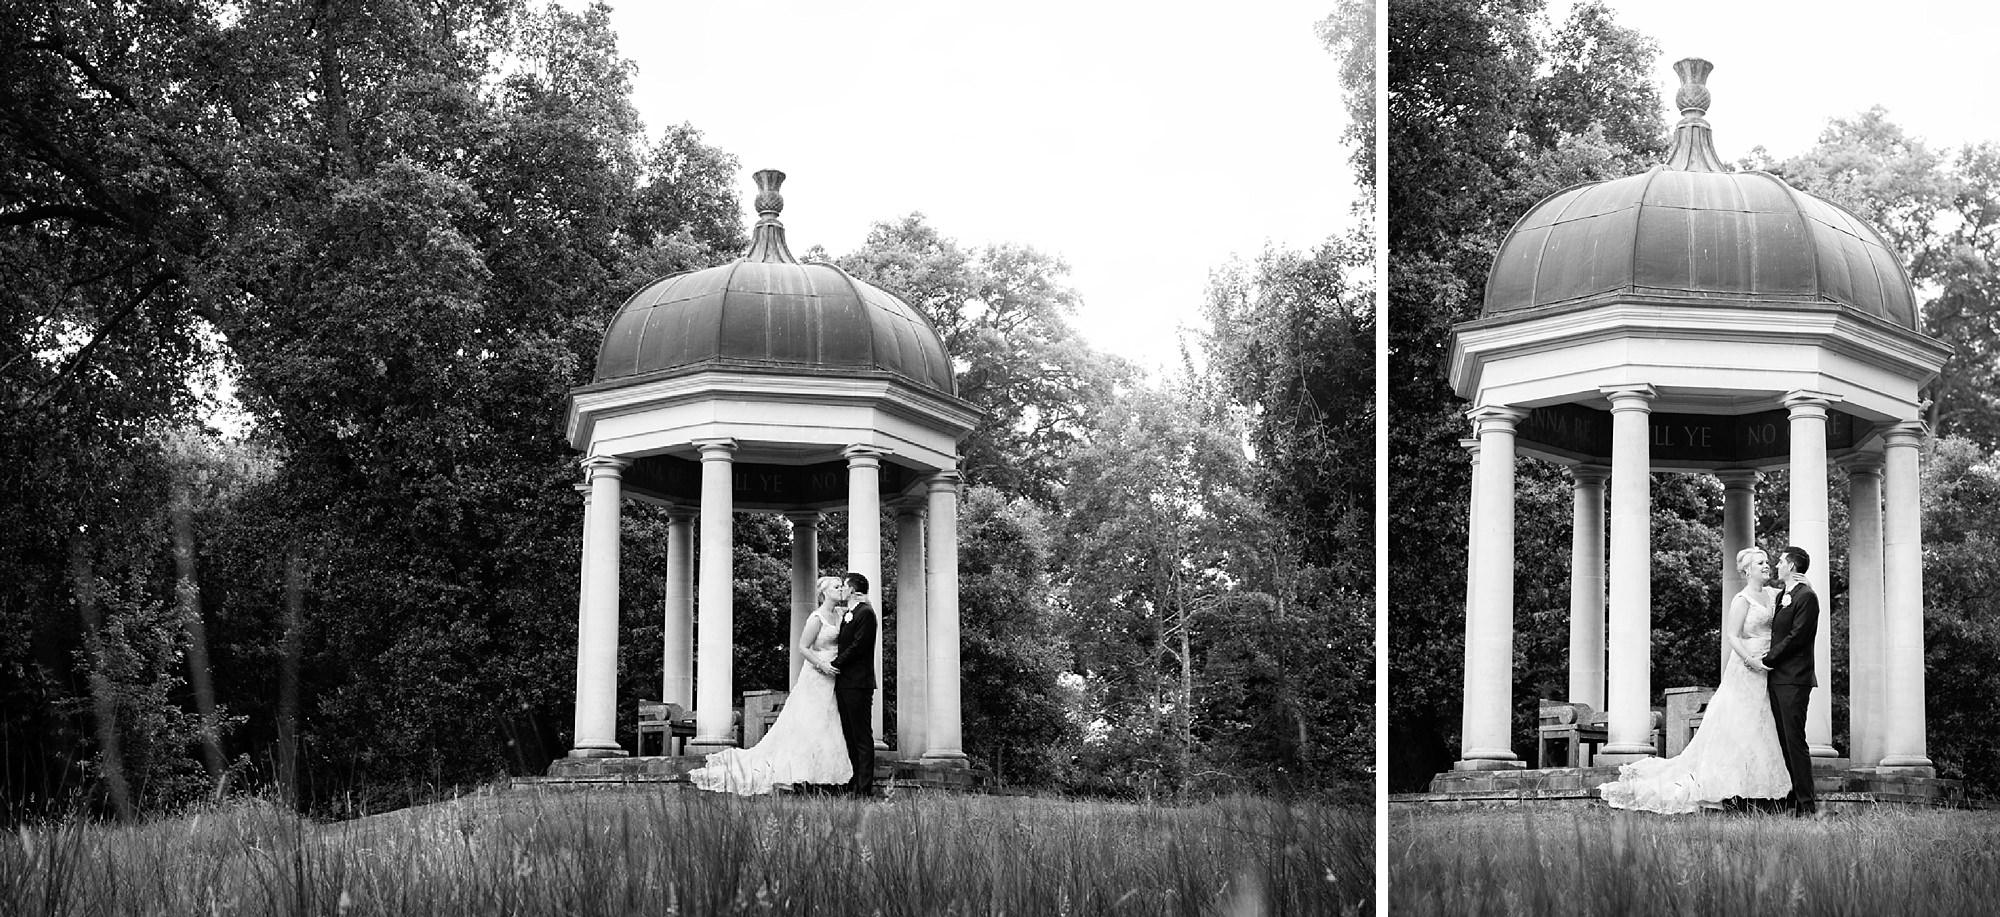 Bignor Park wedding photography bride and groom portrait